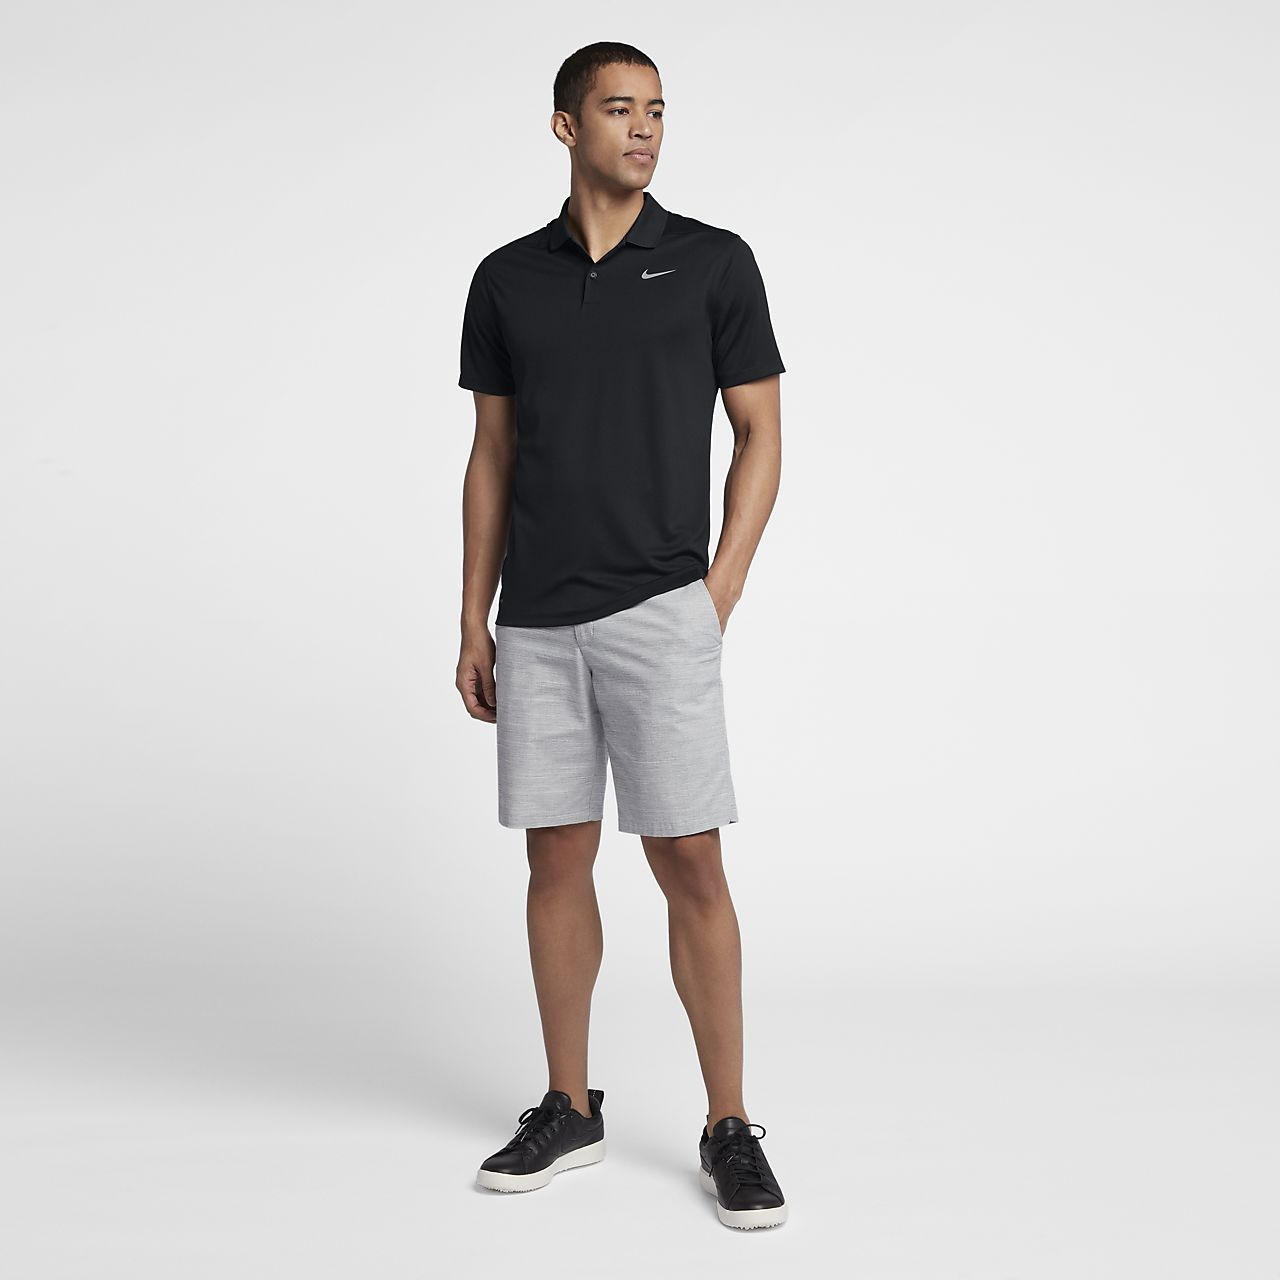 2188a641524e Nike Dri-FIT Victory Men s Slim-Fit Golf Polo. Nike.com CH